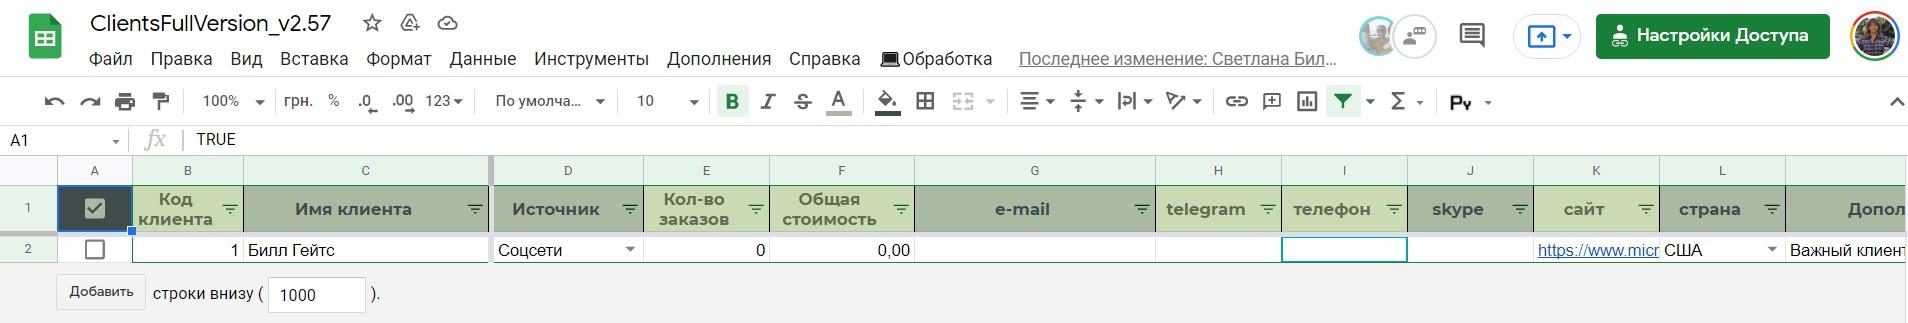 Клиент добавлен в гугл таблицу учета